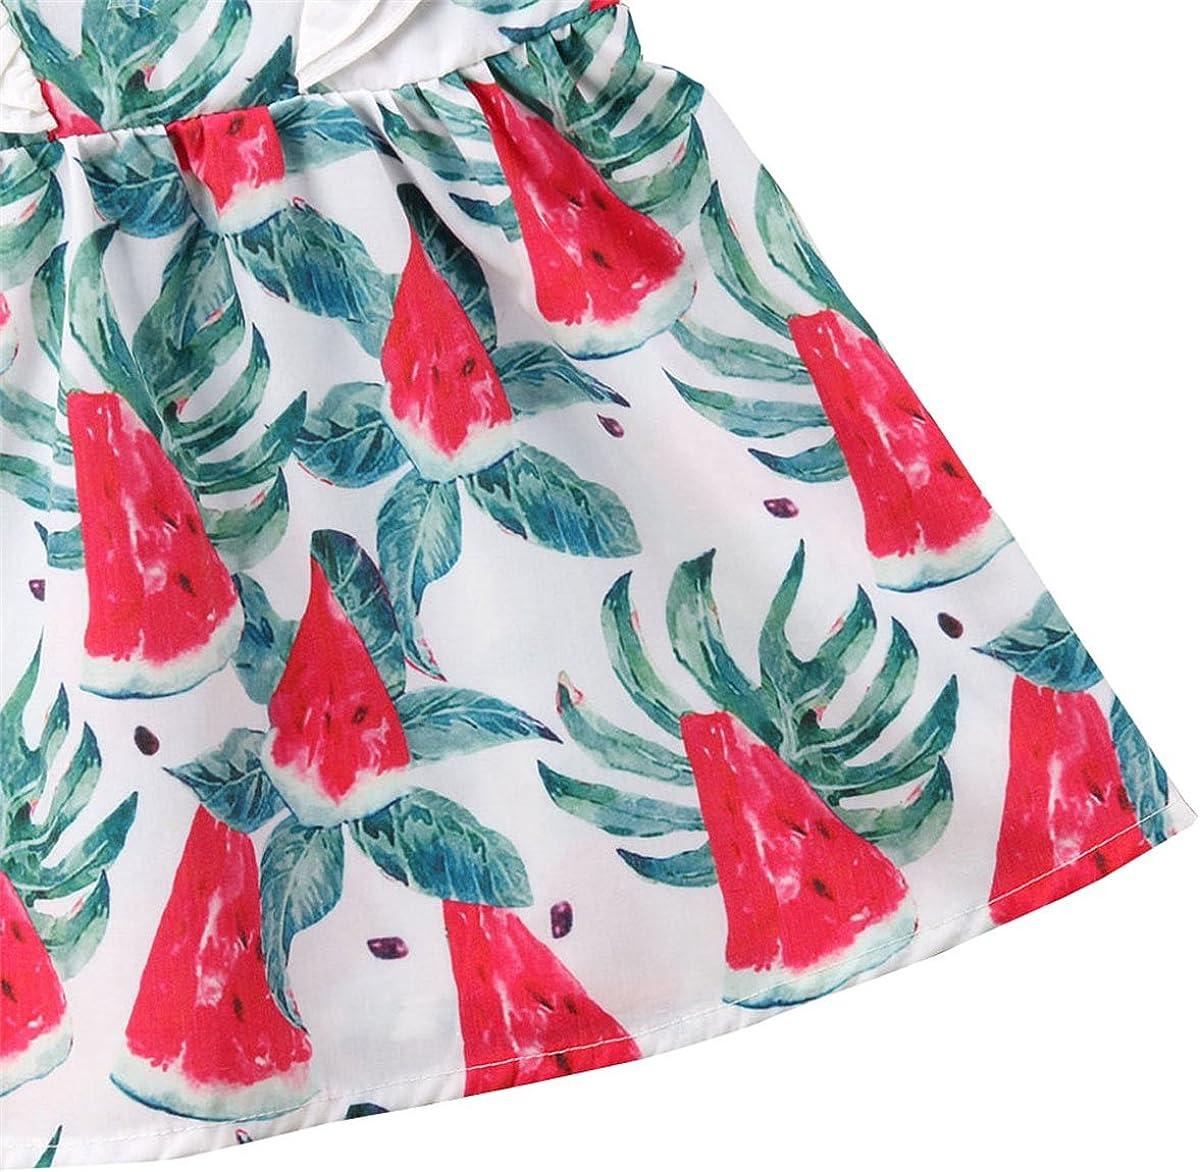 Heartell Baby Girls Sundress Watermelon Princess Dress Sleeveless Lace Cute 1-5T